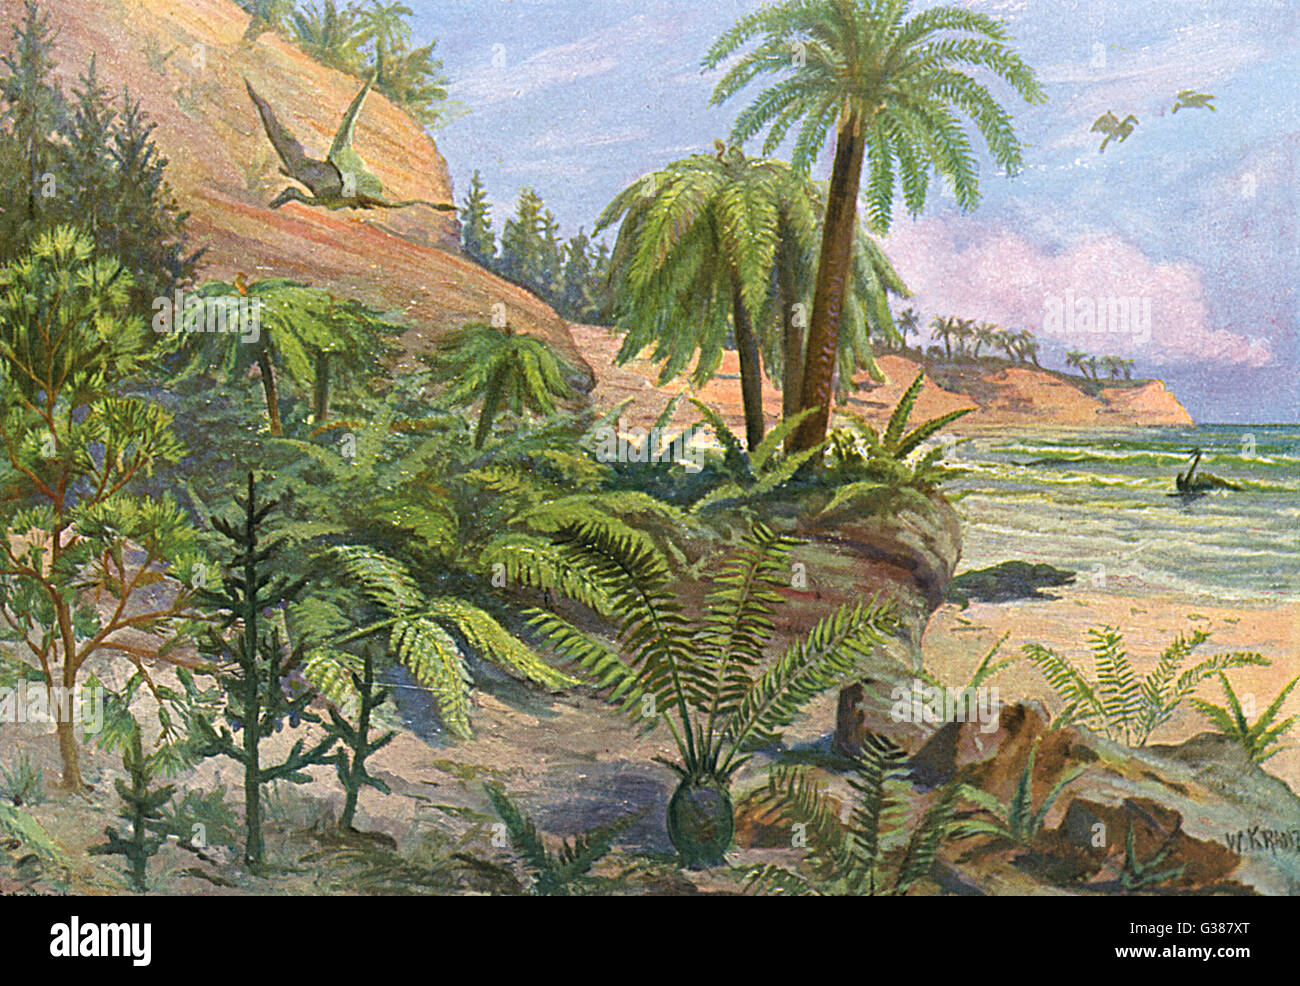 A Jurassic landscape         Date: 208-146 million BC - Stock Image